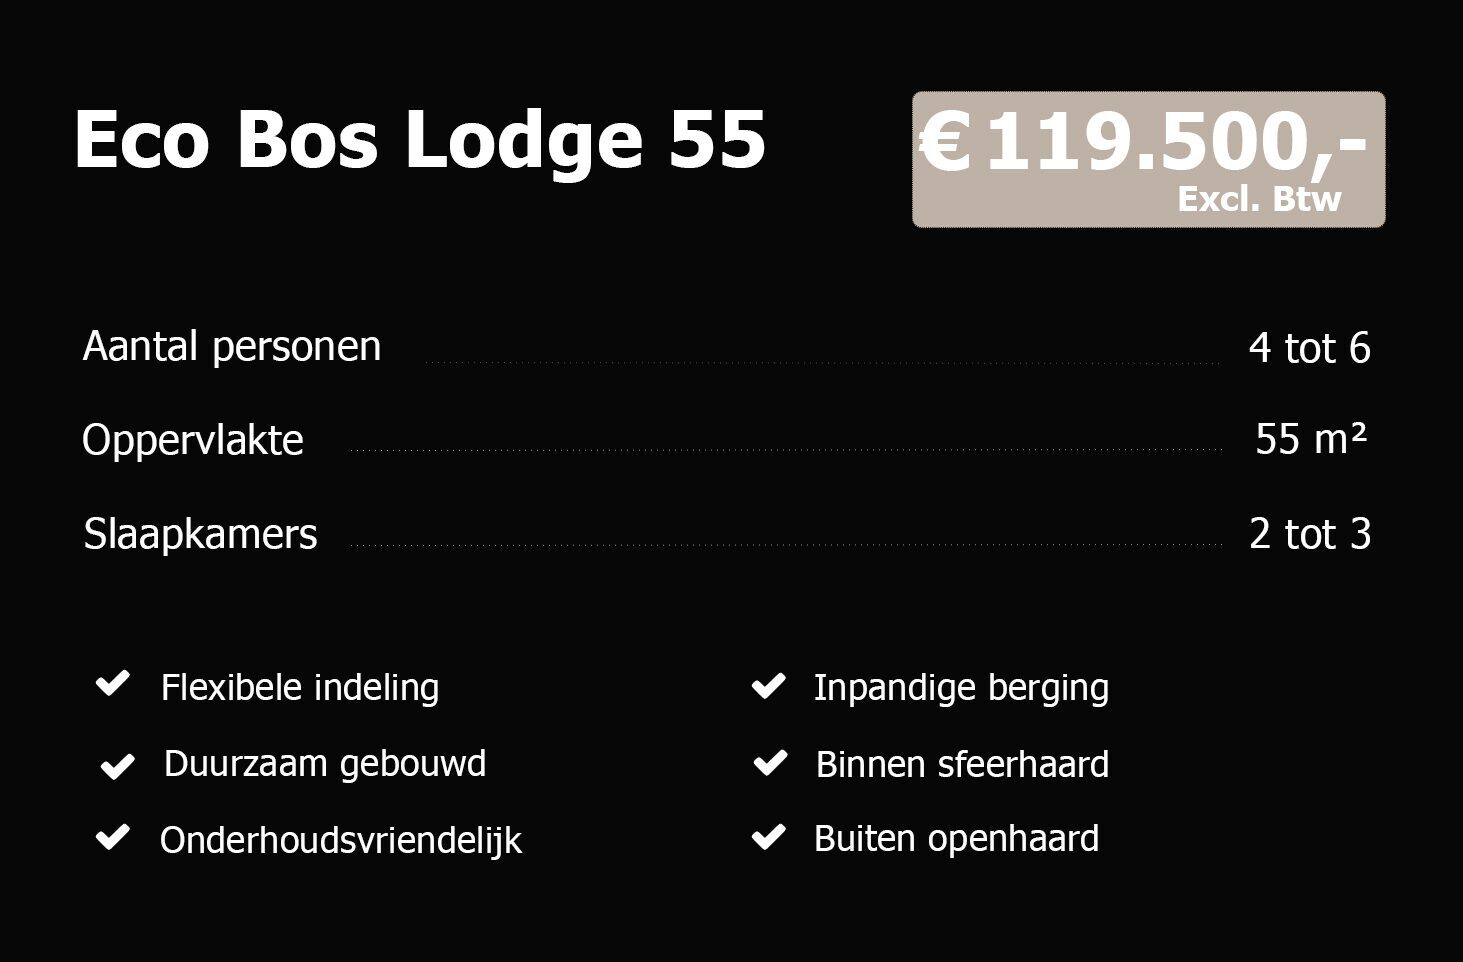 Eco Bos Lodge 55